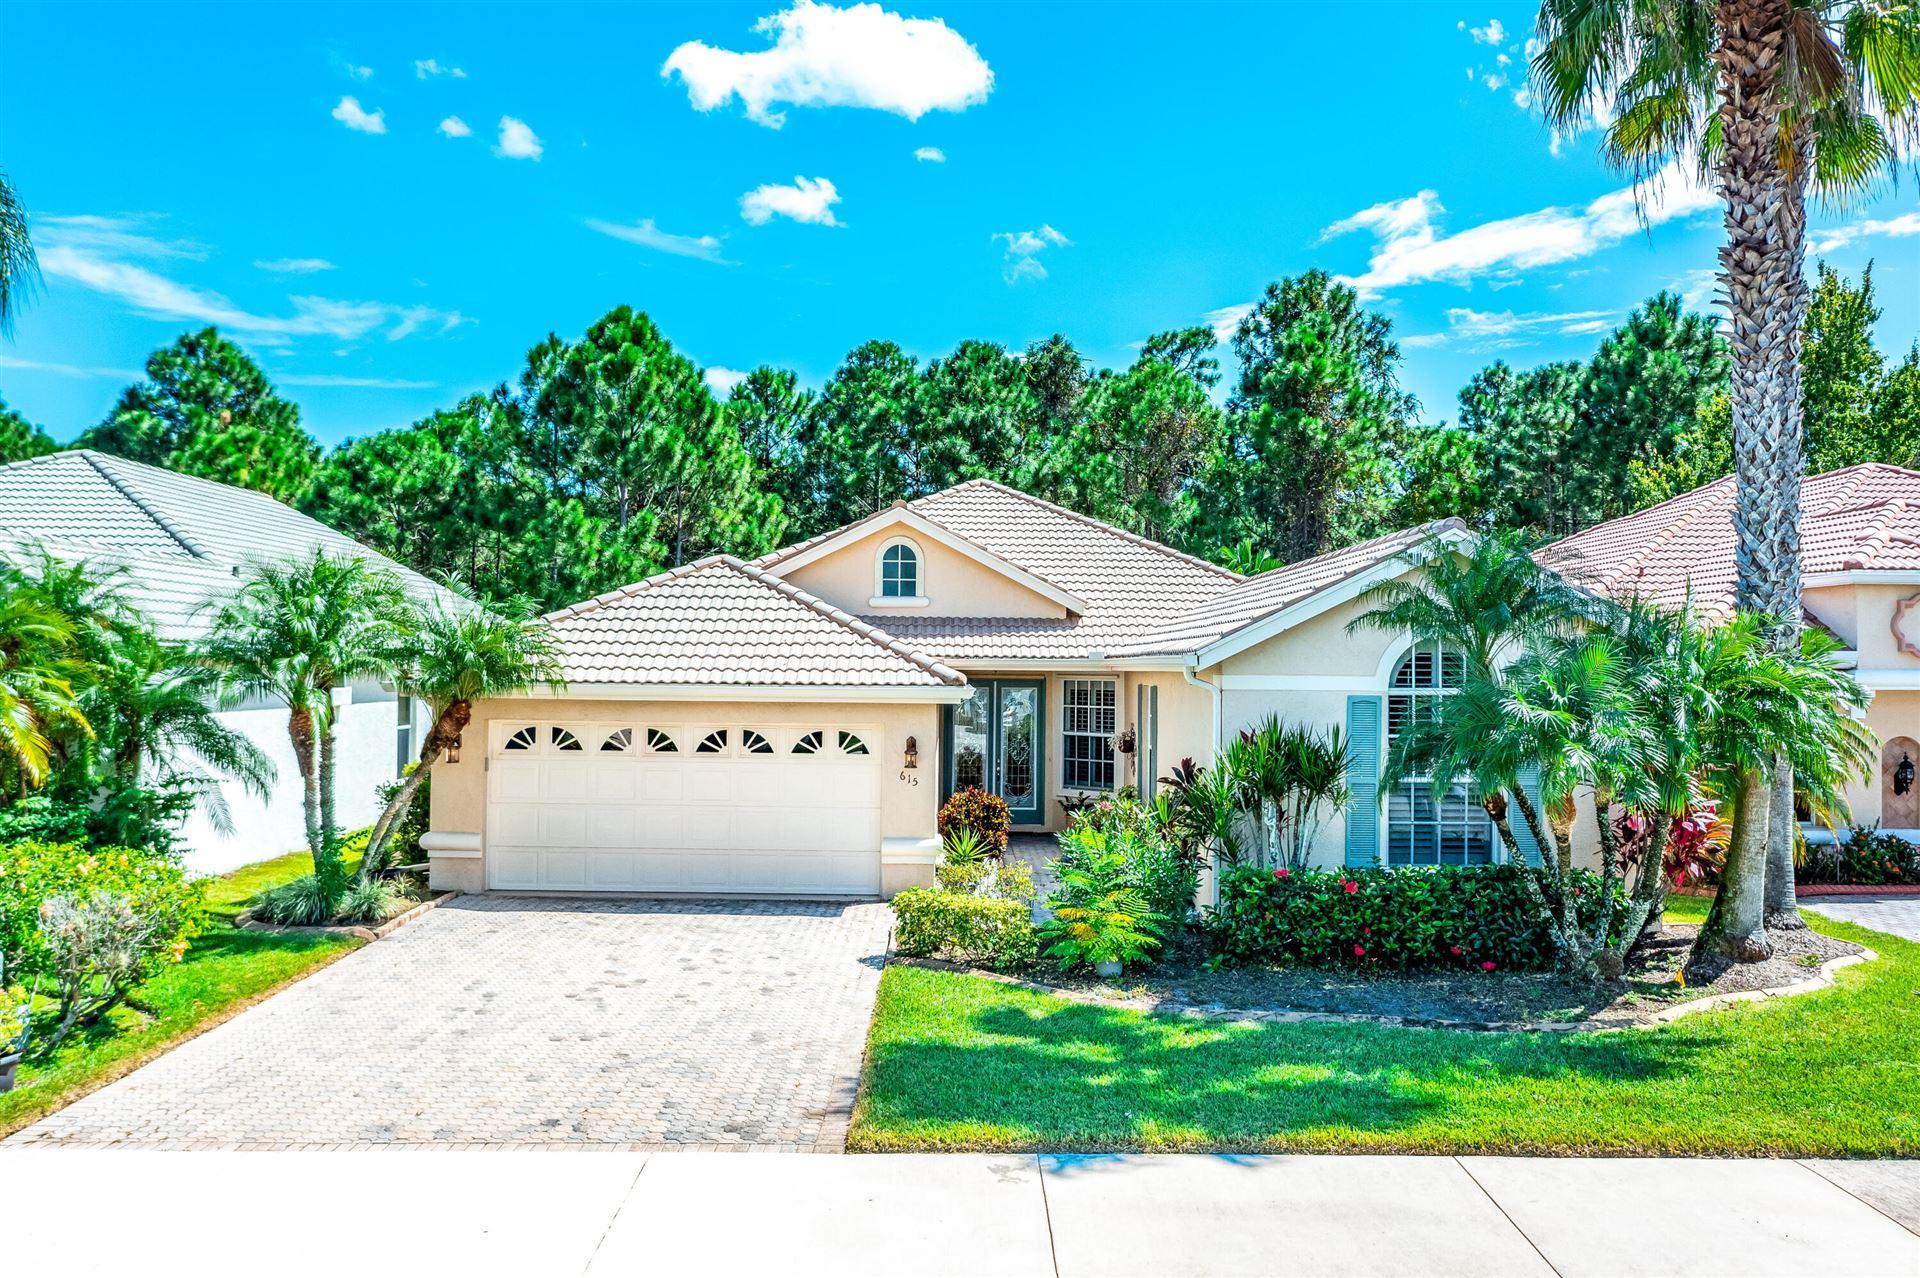 615 SW Lake Charles Circle, Port Saint Lucie, FL 34986 - #: RX-10750992